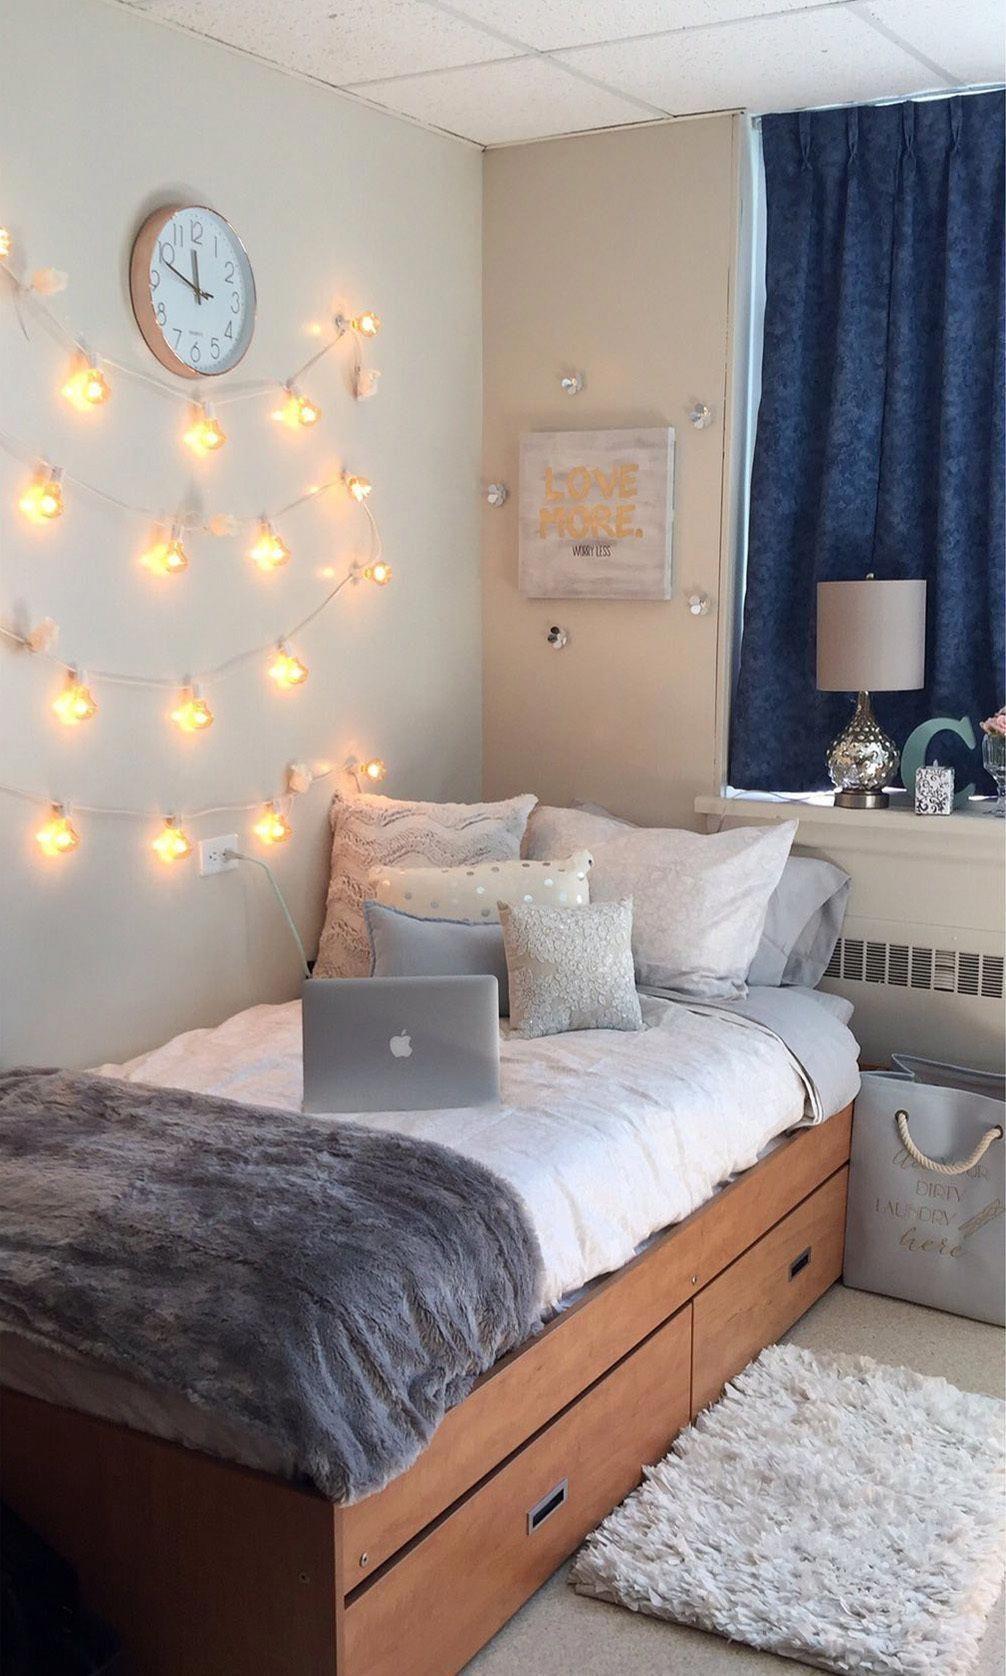 48 Genius Diy Dorm Room Decorating Ideas Dorm Room Diy Dorm